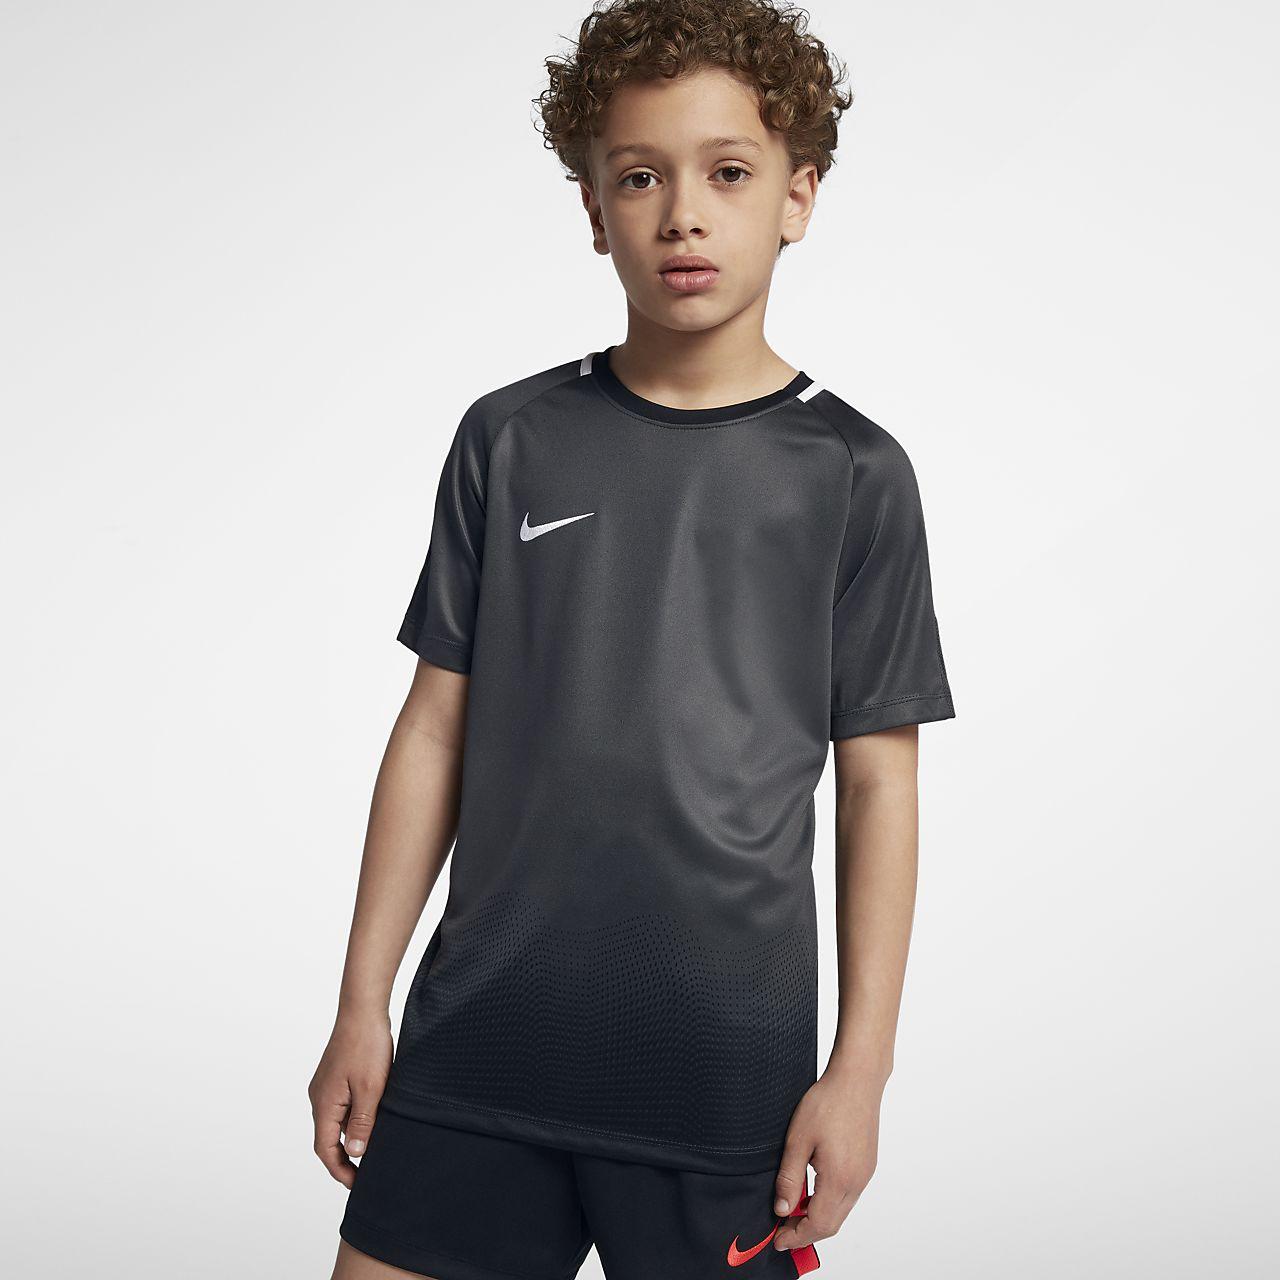 ... Top de fútbol de manga corta para niño talla grande Nike Dri-FIT Academy